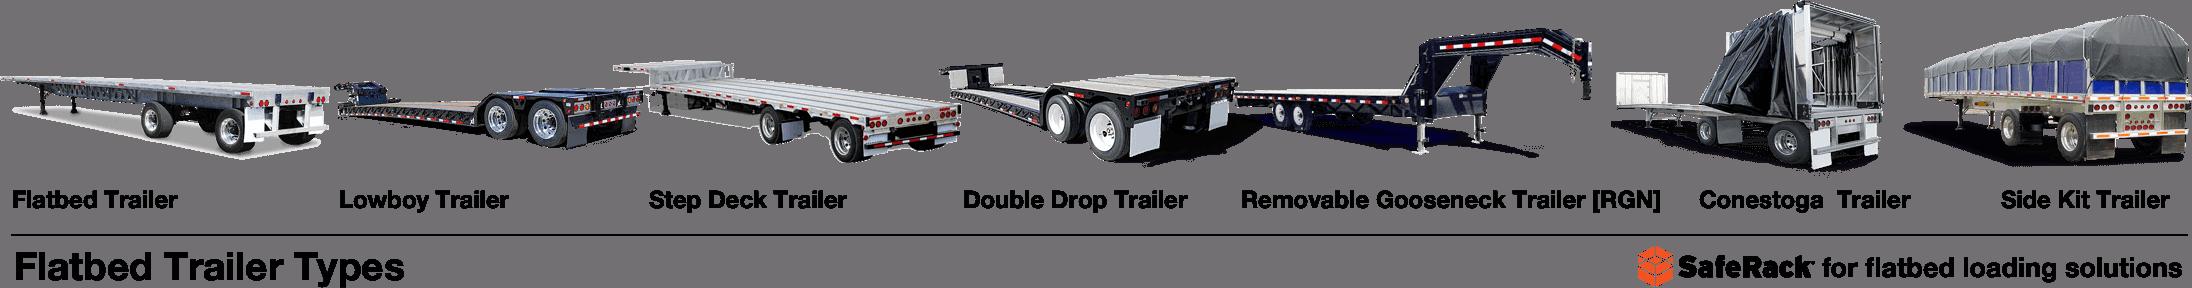 Flatbed Trailer Types